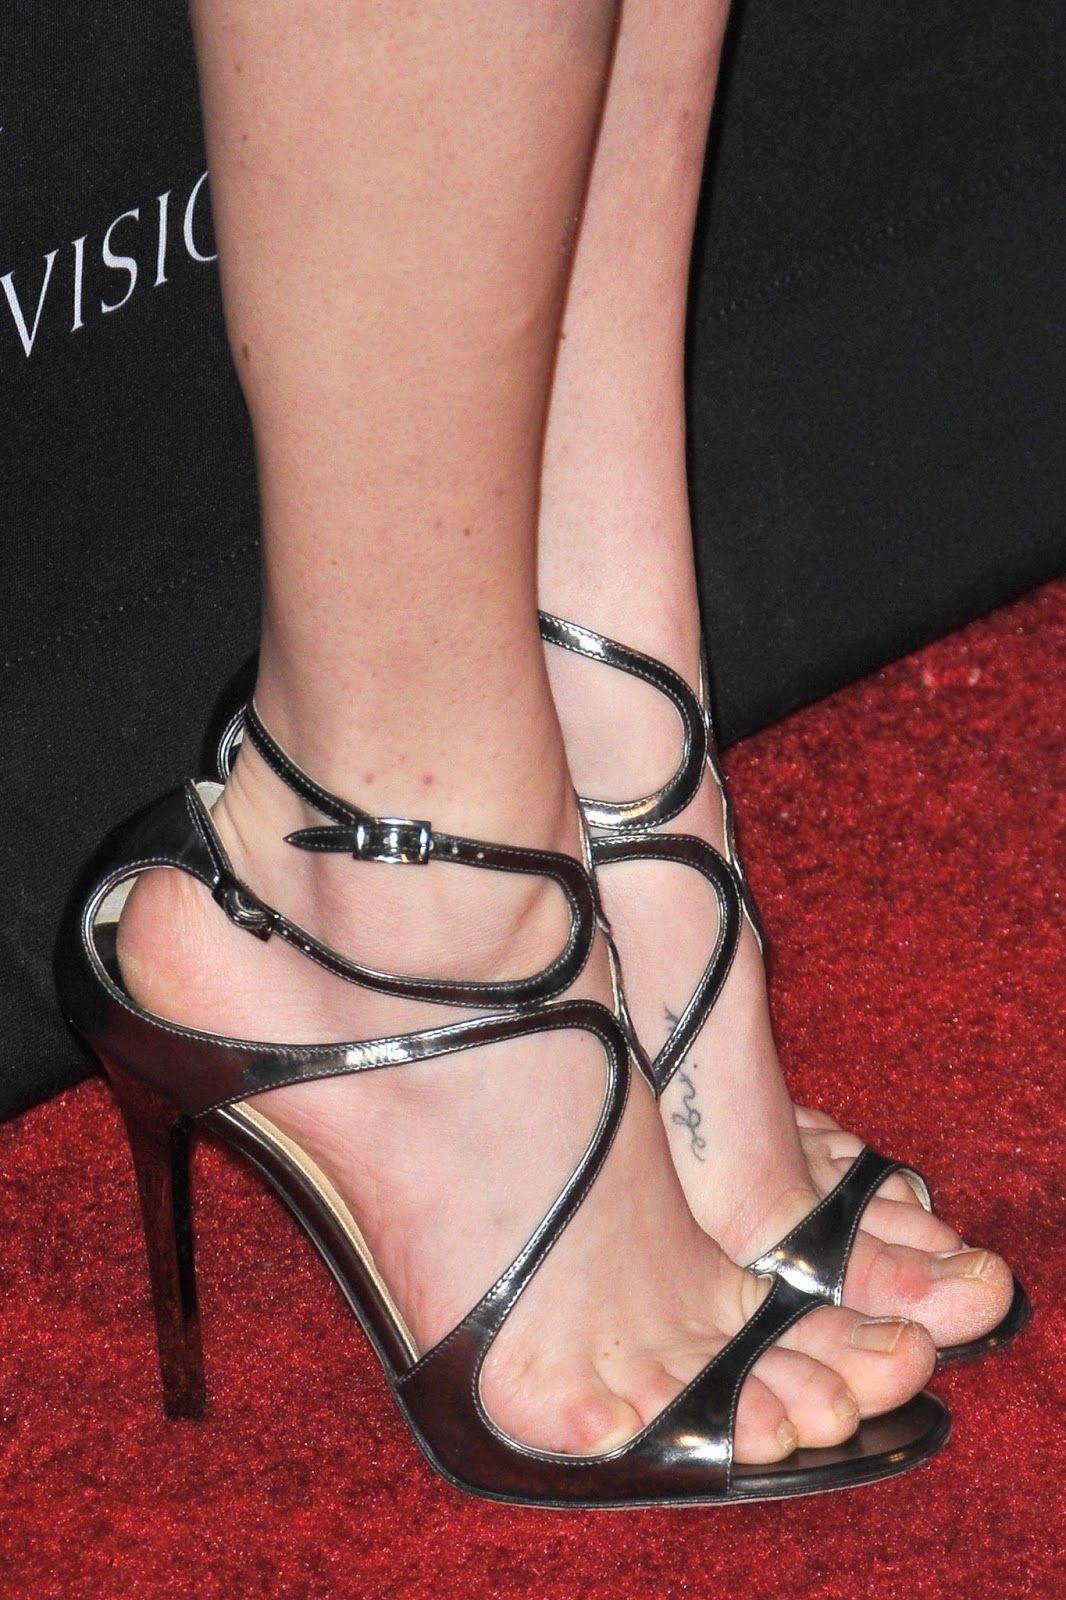 Feet Amanda Seyfried nudes (94 foto and video), Pussy, Leaked, Instagram, braless 2019